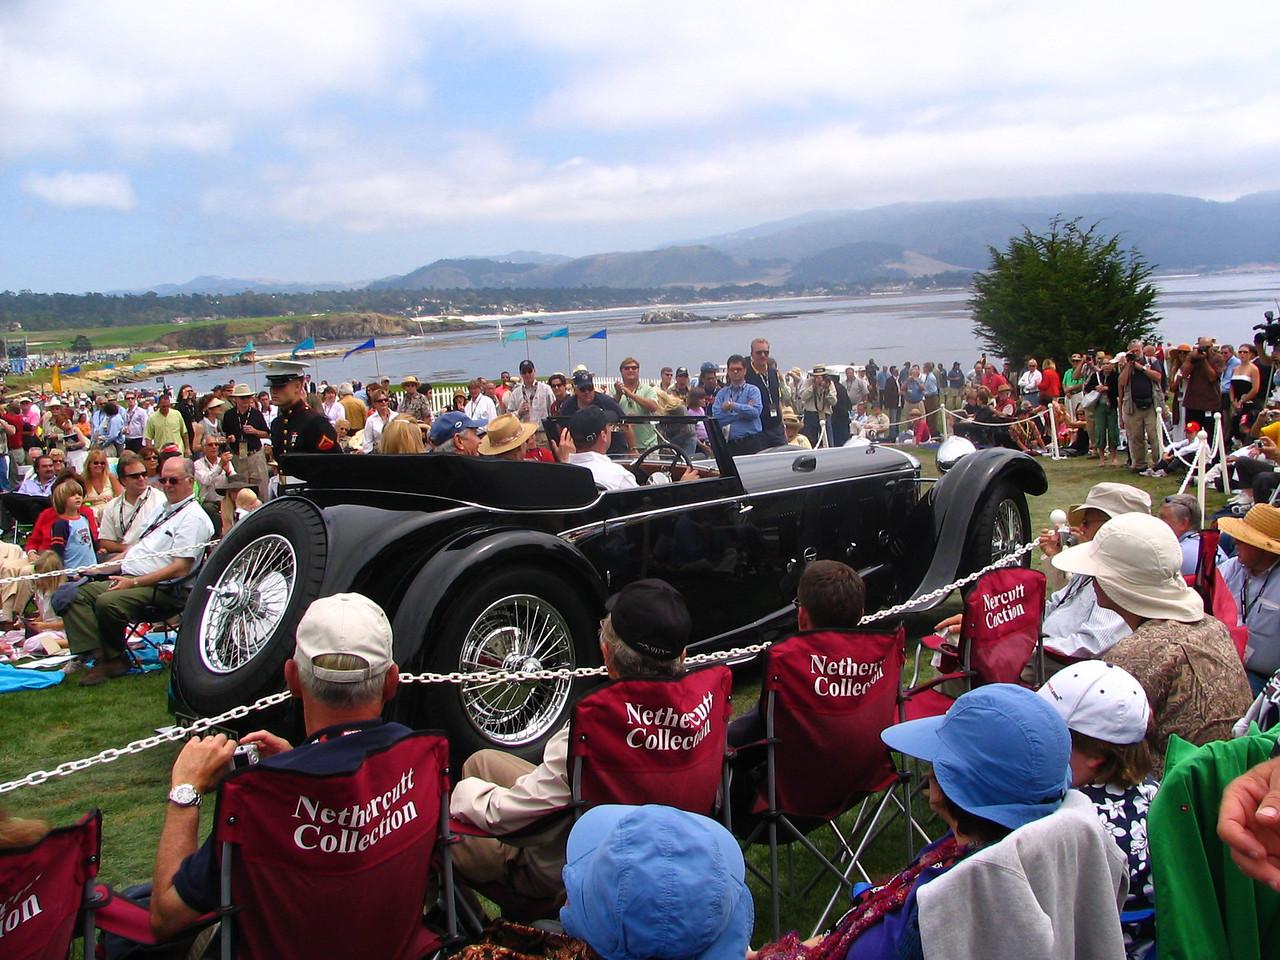 Class J-2, European Classic 1925-1935 Open Early, Winner -- 1931 Daimler Double-Six 50 Corsica Drophead Coupe